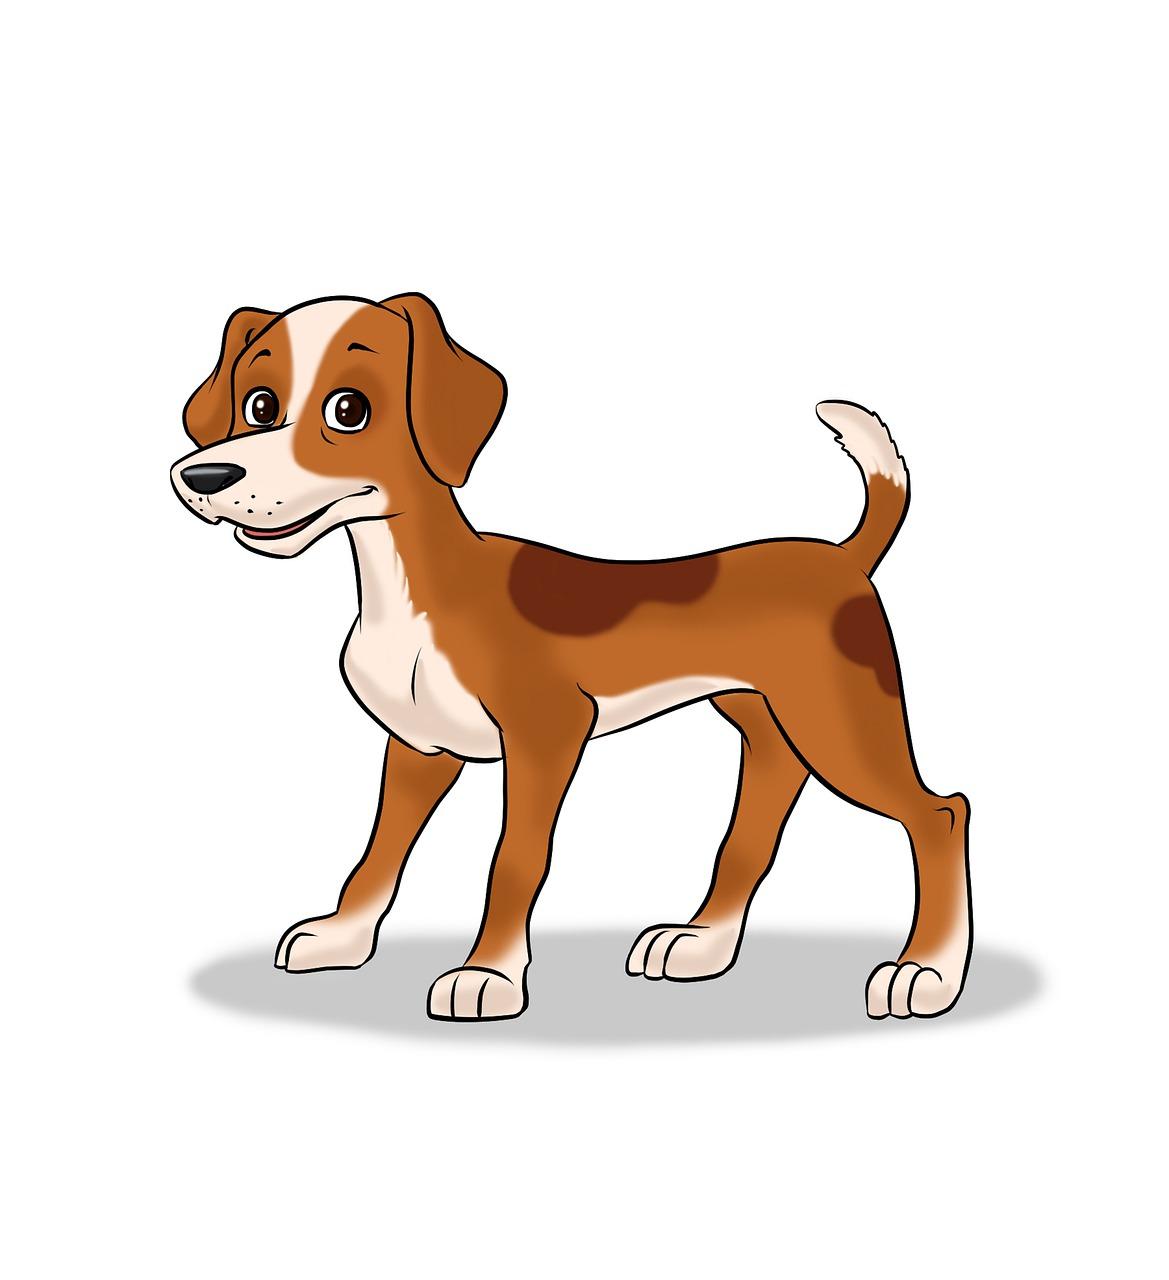 Anjing Kartun Ilustrasi Gambar Gratis Di Pixabay